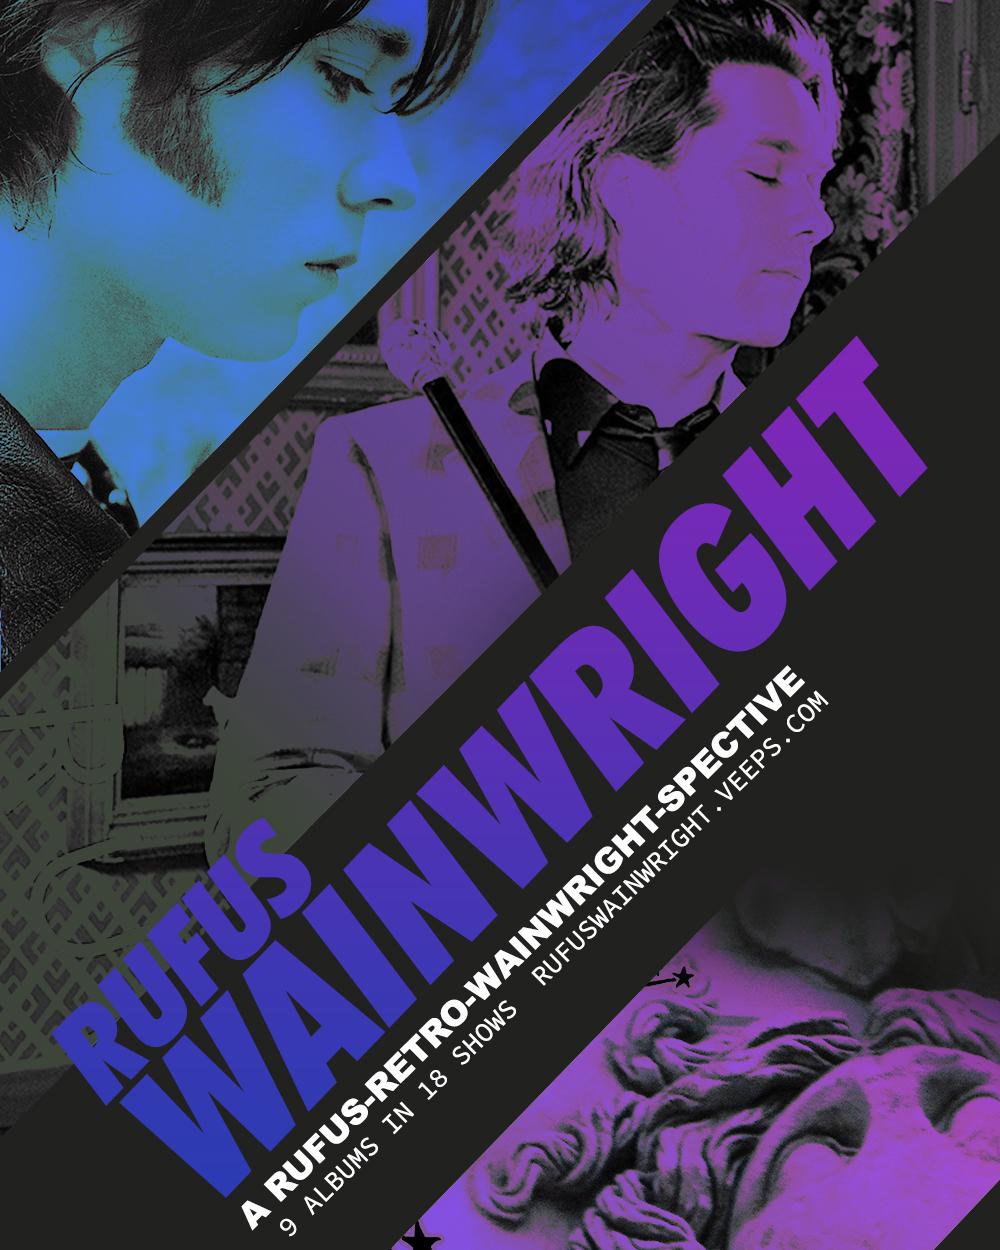 『A Rufus-Retro-Wainwright-Spective Tour 2020-2021』フライヤー